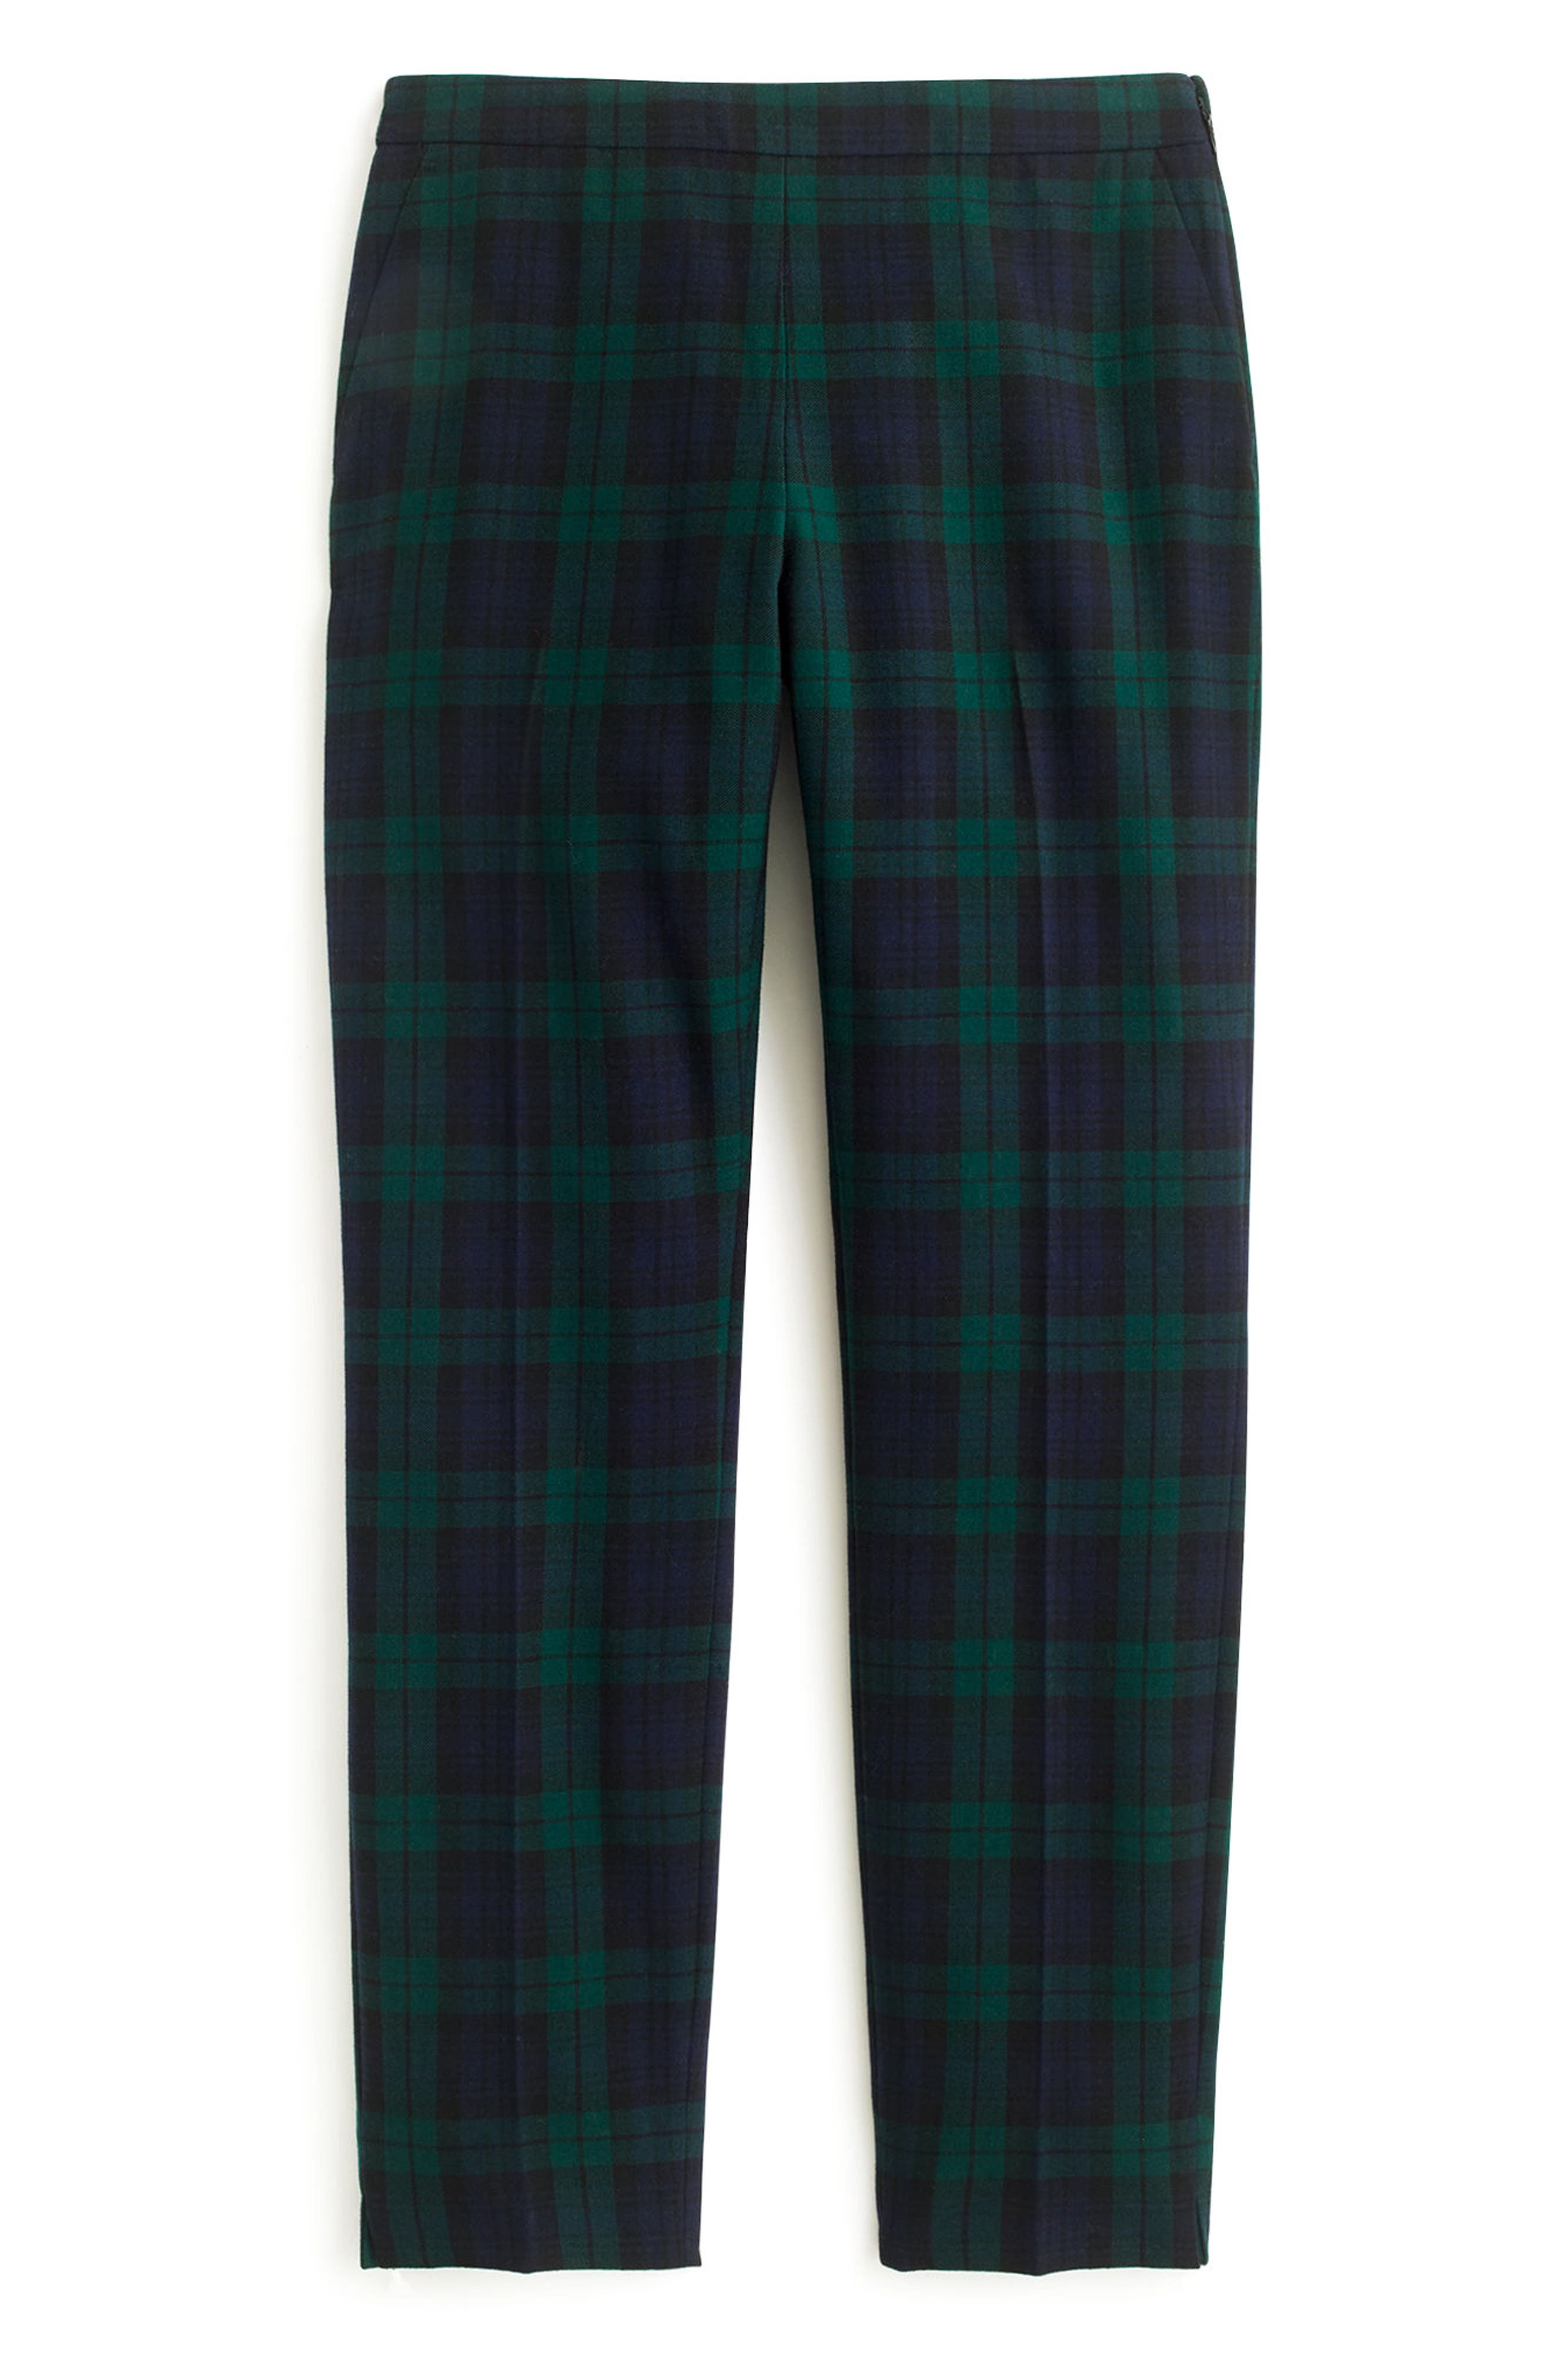 J.Crew Martie Black Watch Stretch Wool Blend Crop Pants,                         Main,                         color, Navy Multi